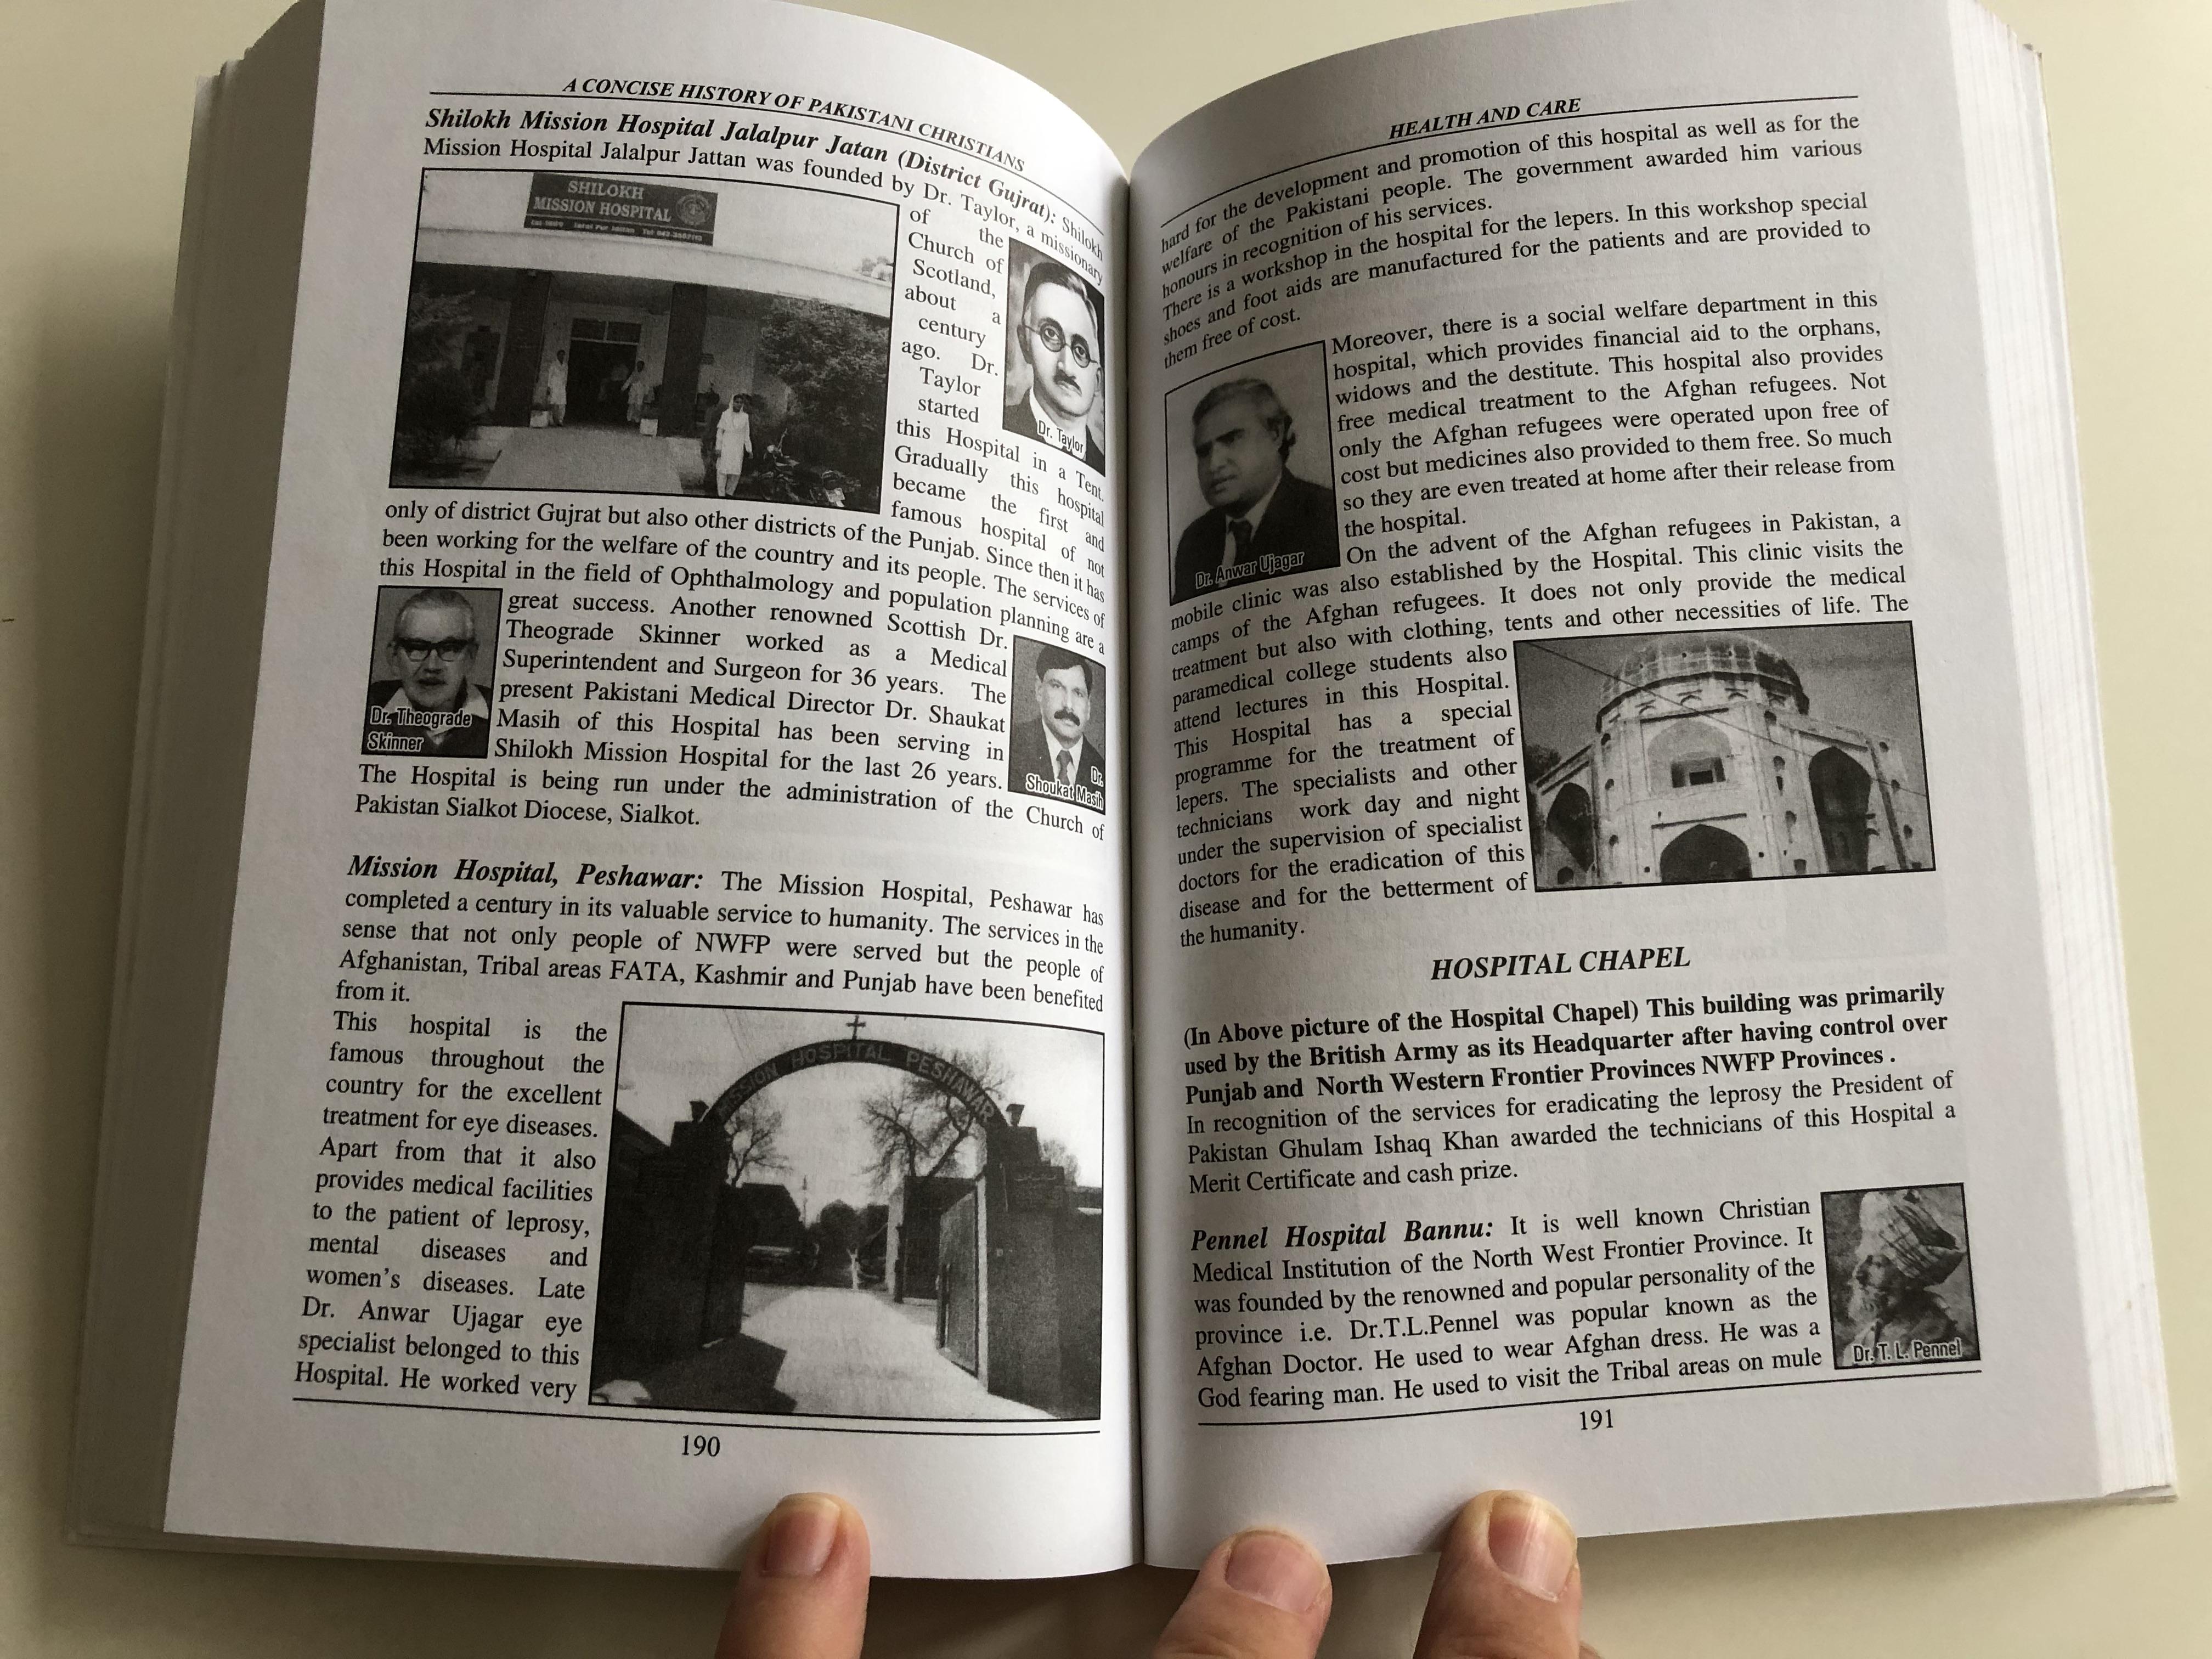 a-concise-history-of-pakistani-christians-by-emmanuel-zafar-humsookhan-publication-paperback-2007-15-.jpg